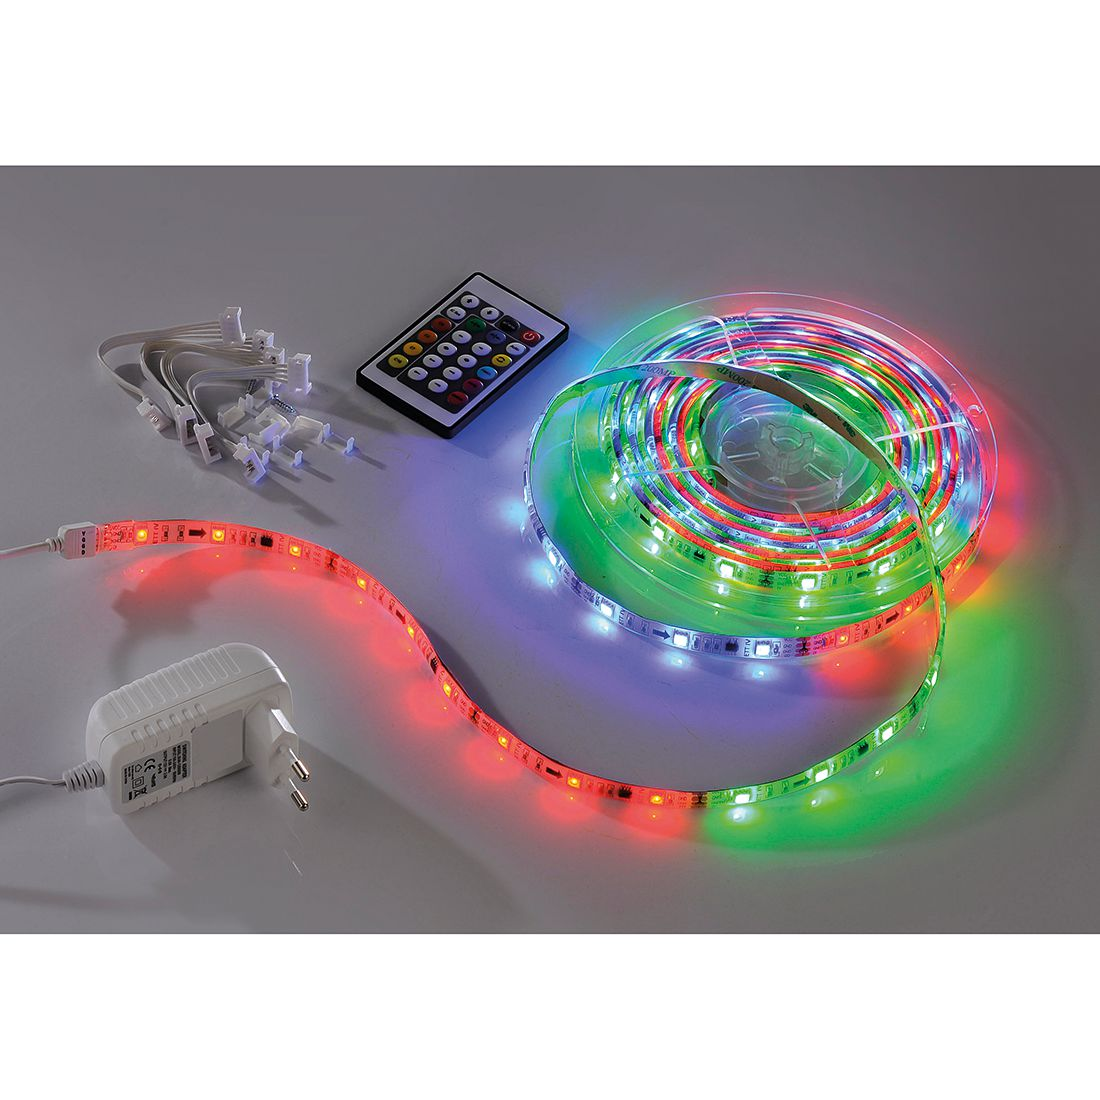 Klemm-/Möbelleuchten Teania by Leuchten Direkt ● Kunststoff ● Multicolor ● 1-flammig- Leuchten Direkt A+